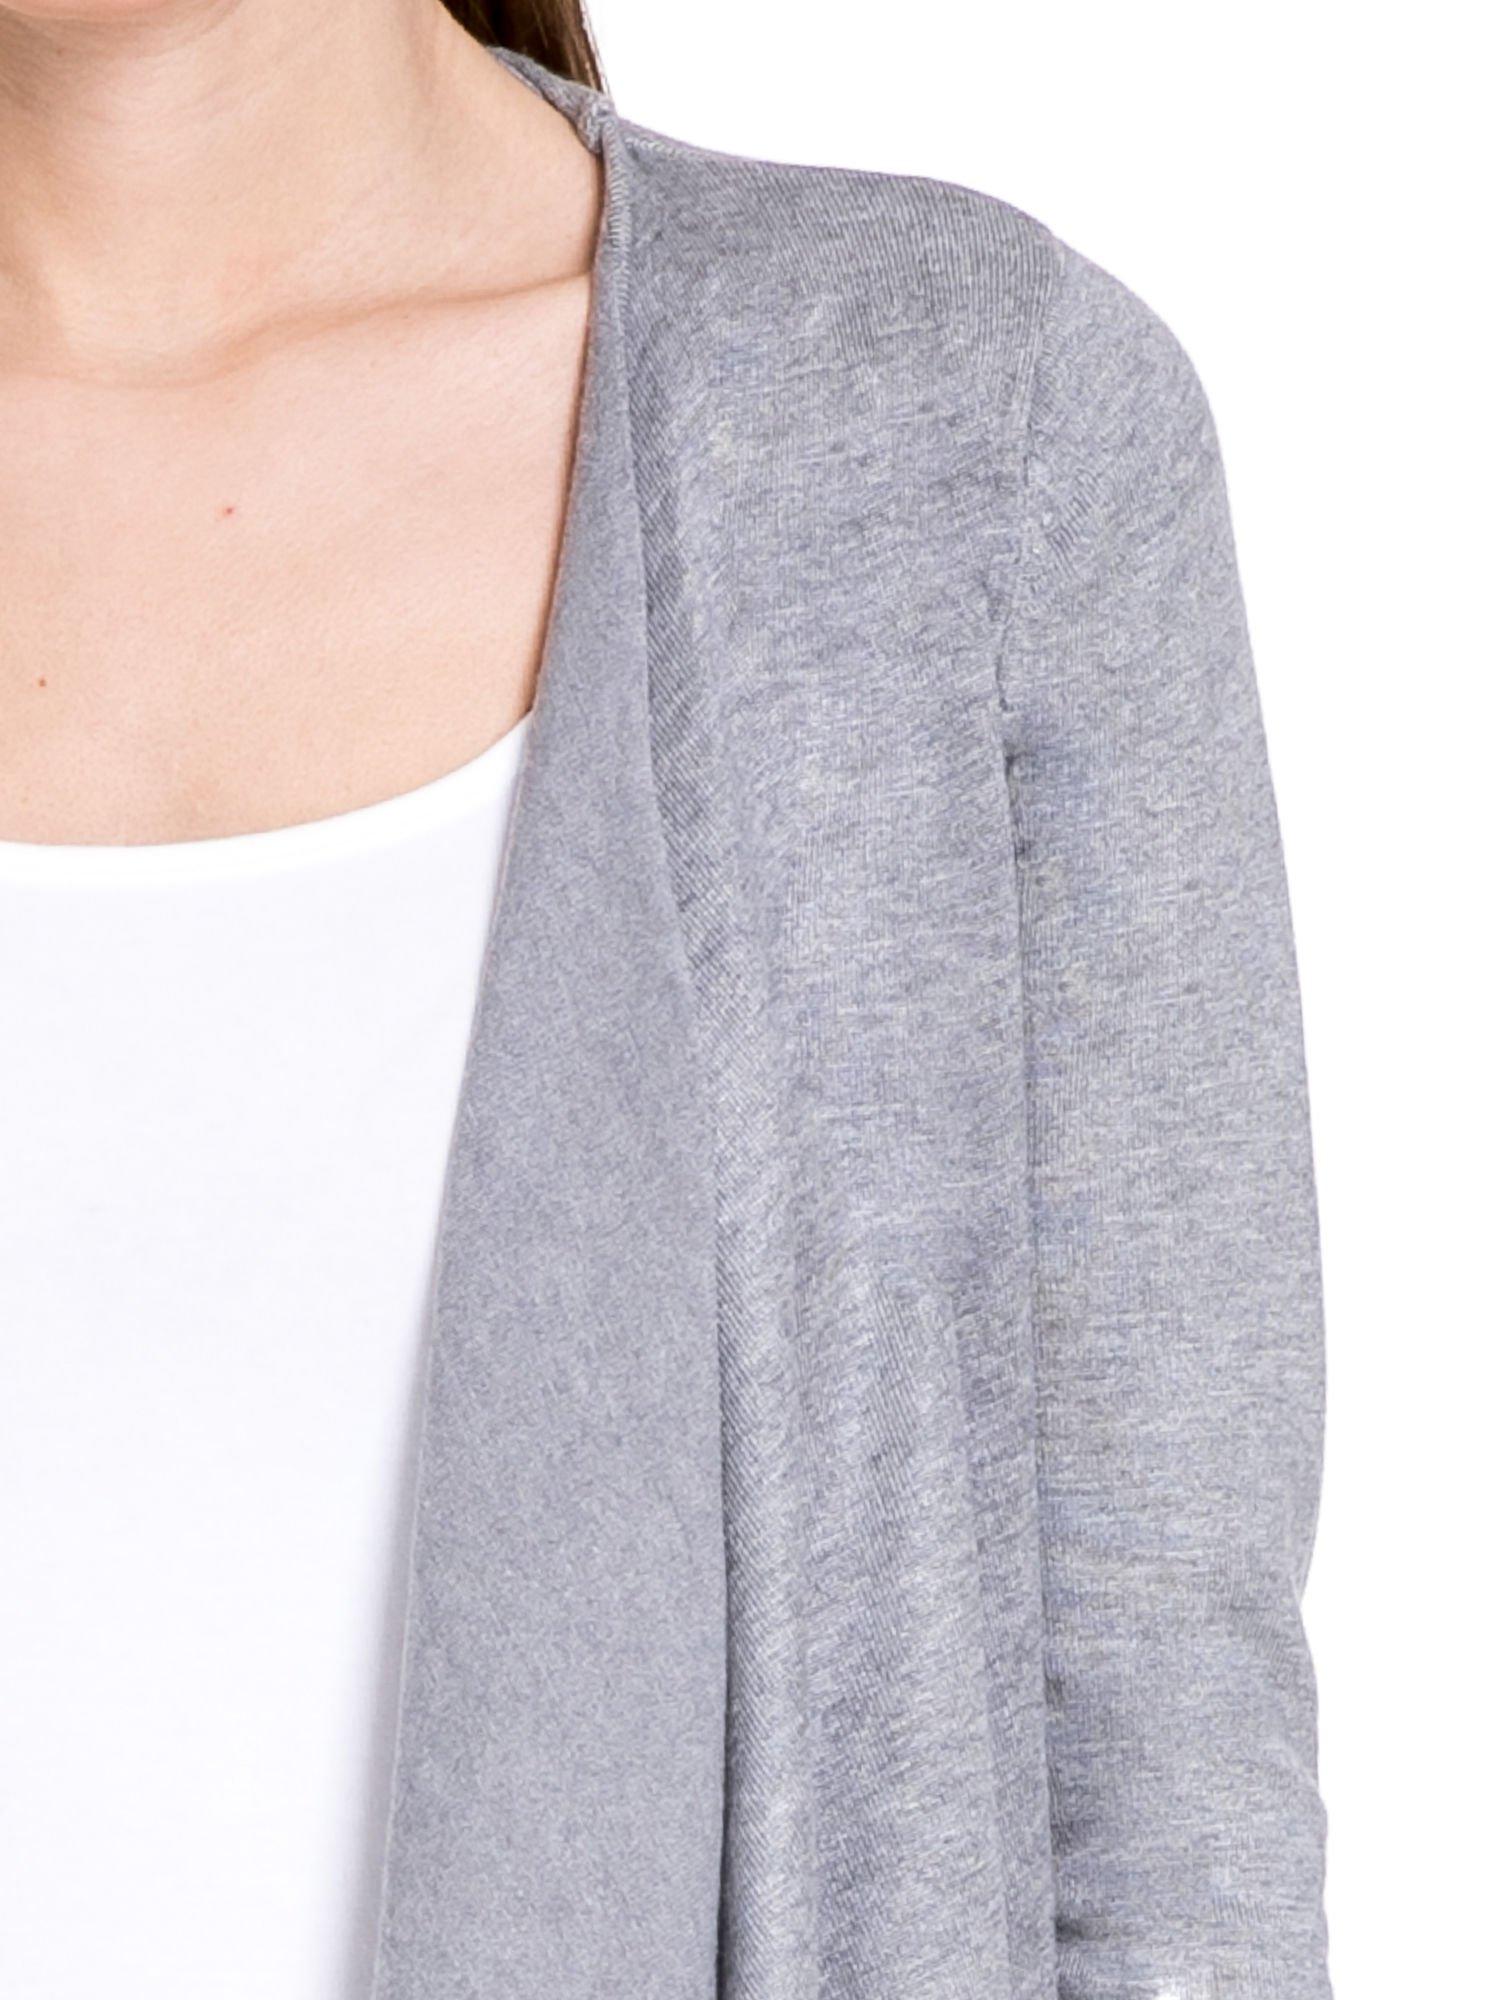 Szary sweter narzutka o kroju waterfall                                  zdj.                                  5